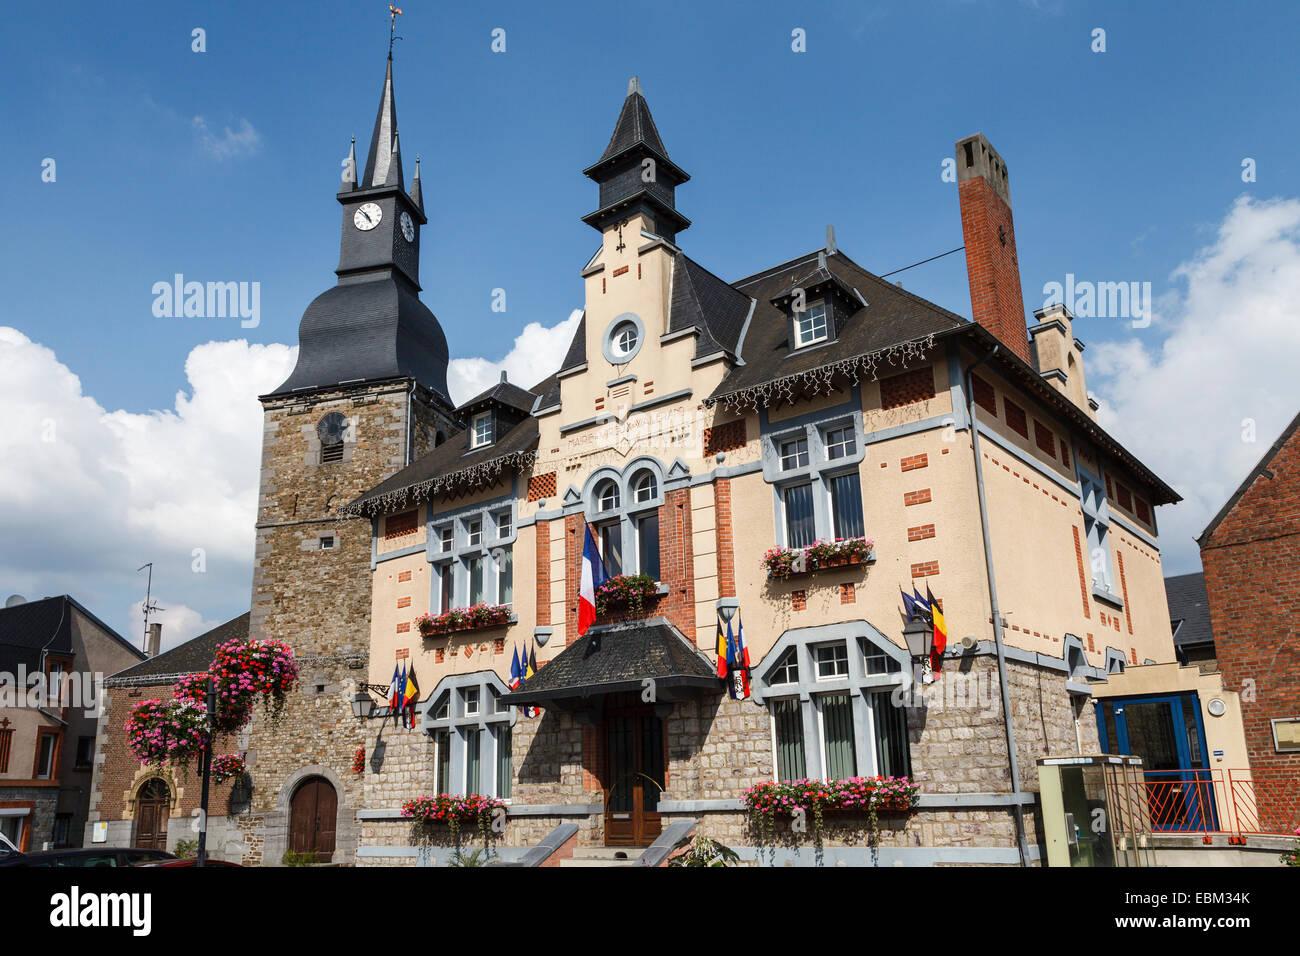 Vireux-Wallerand, Ardennes, France - Stock Image